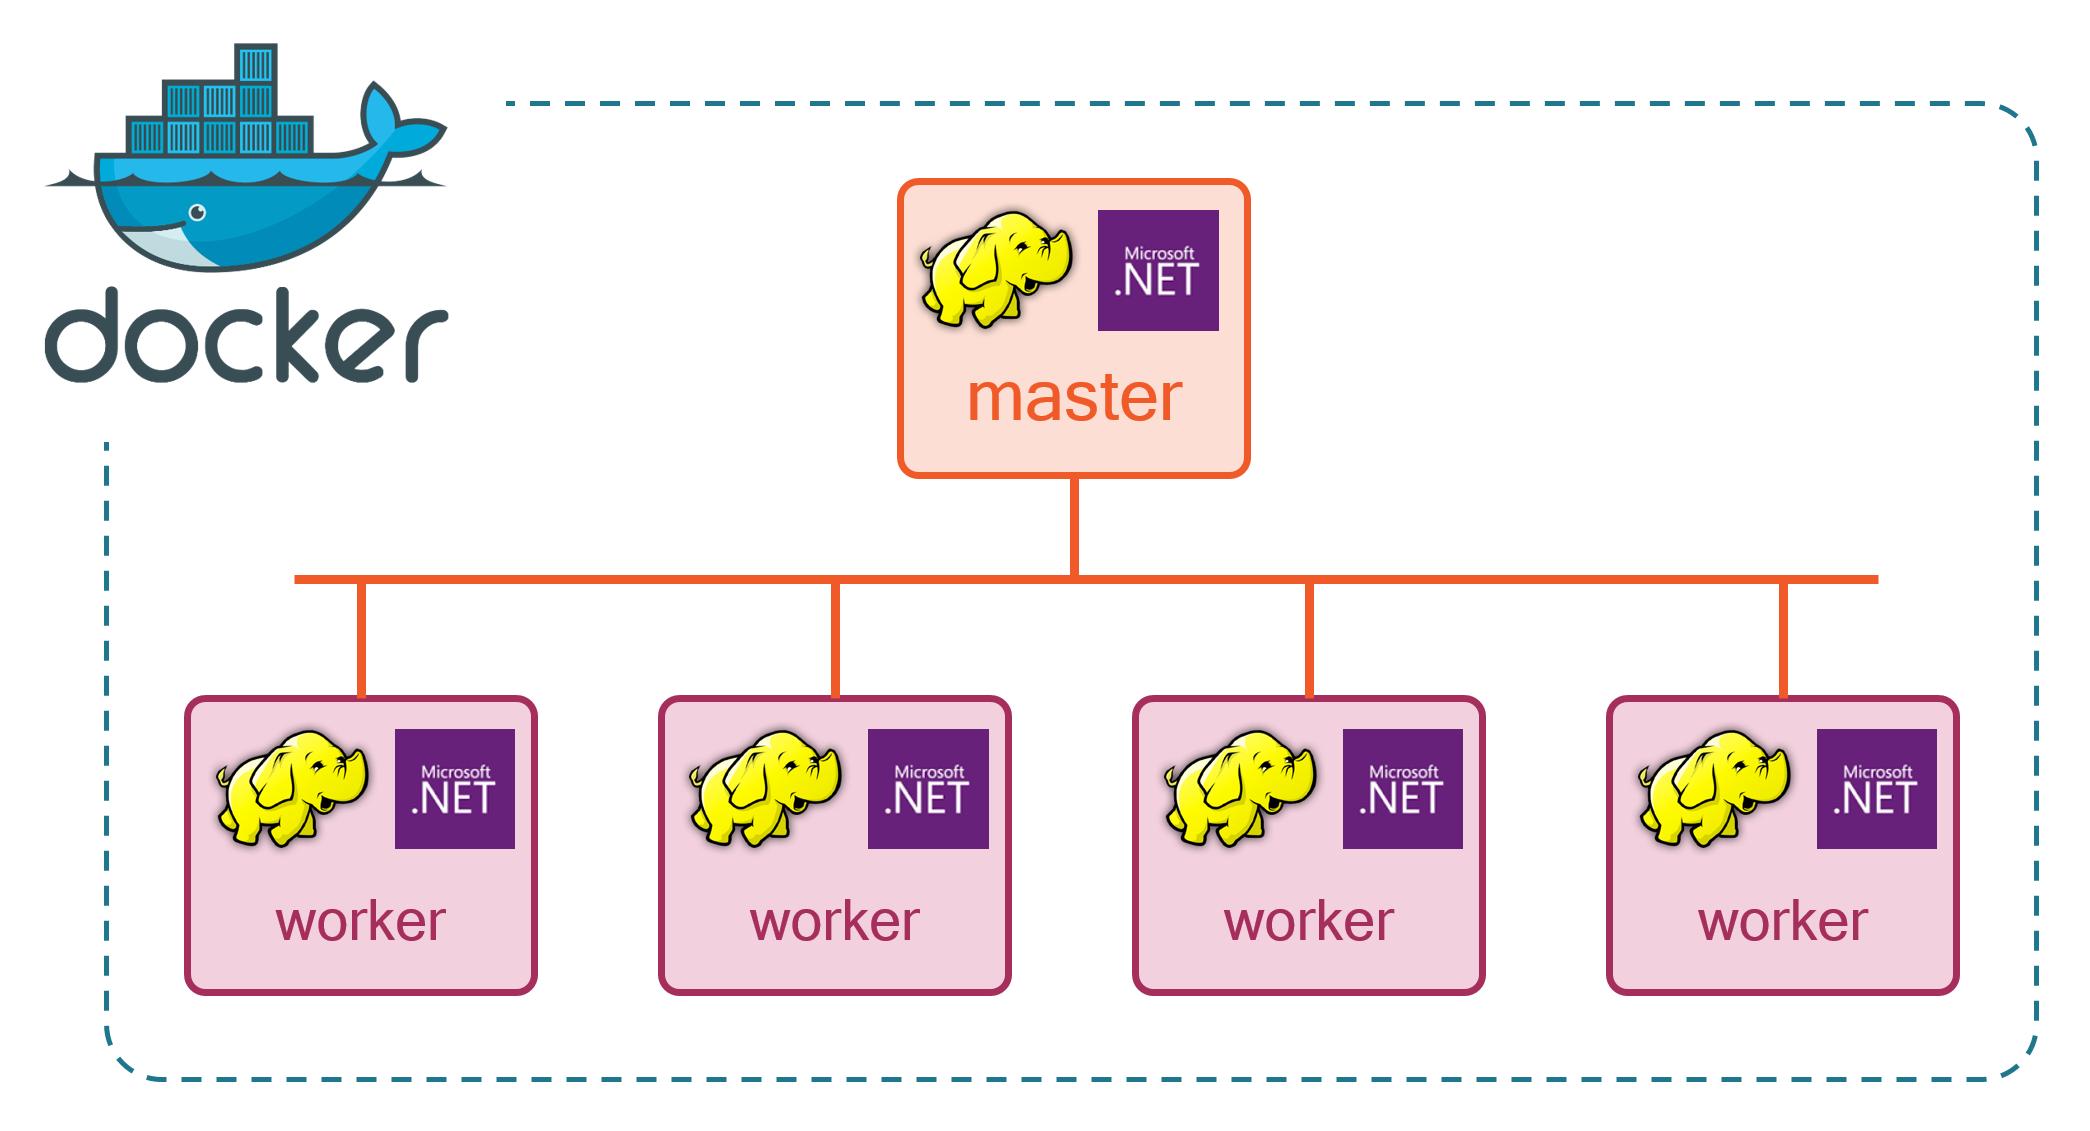 Hadoop and .NET: A Match Made in Docker